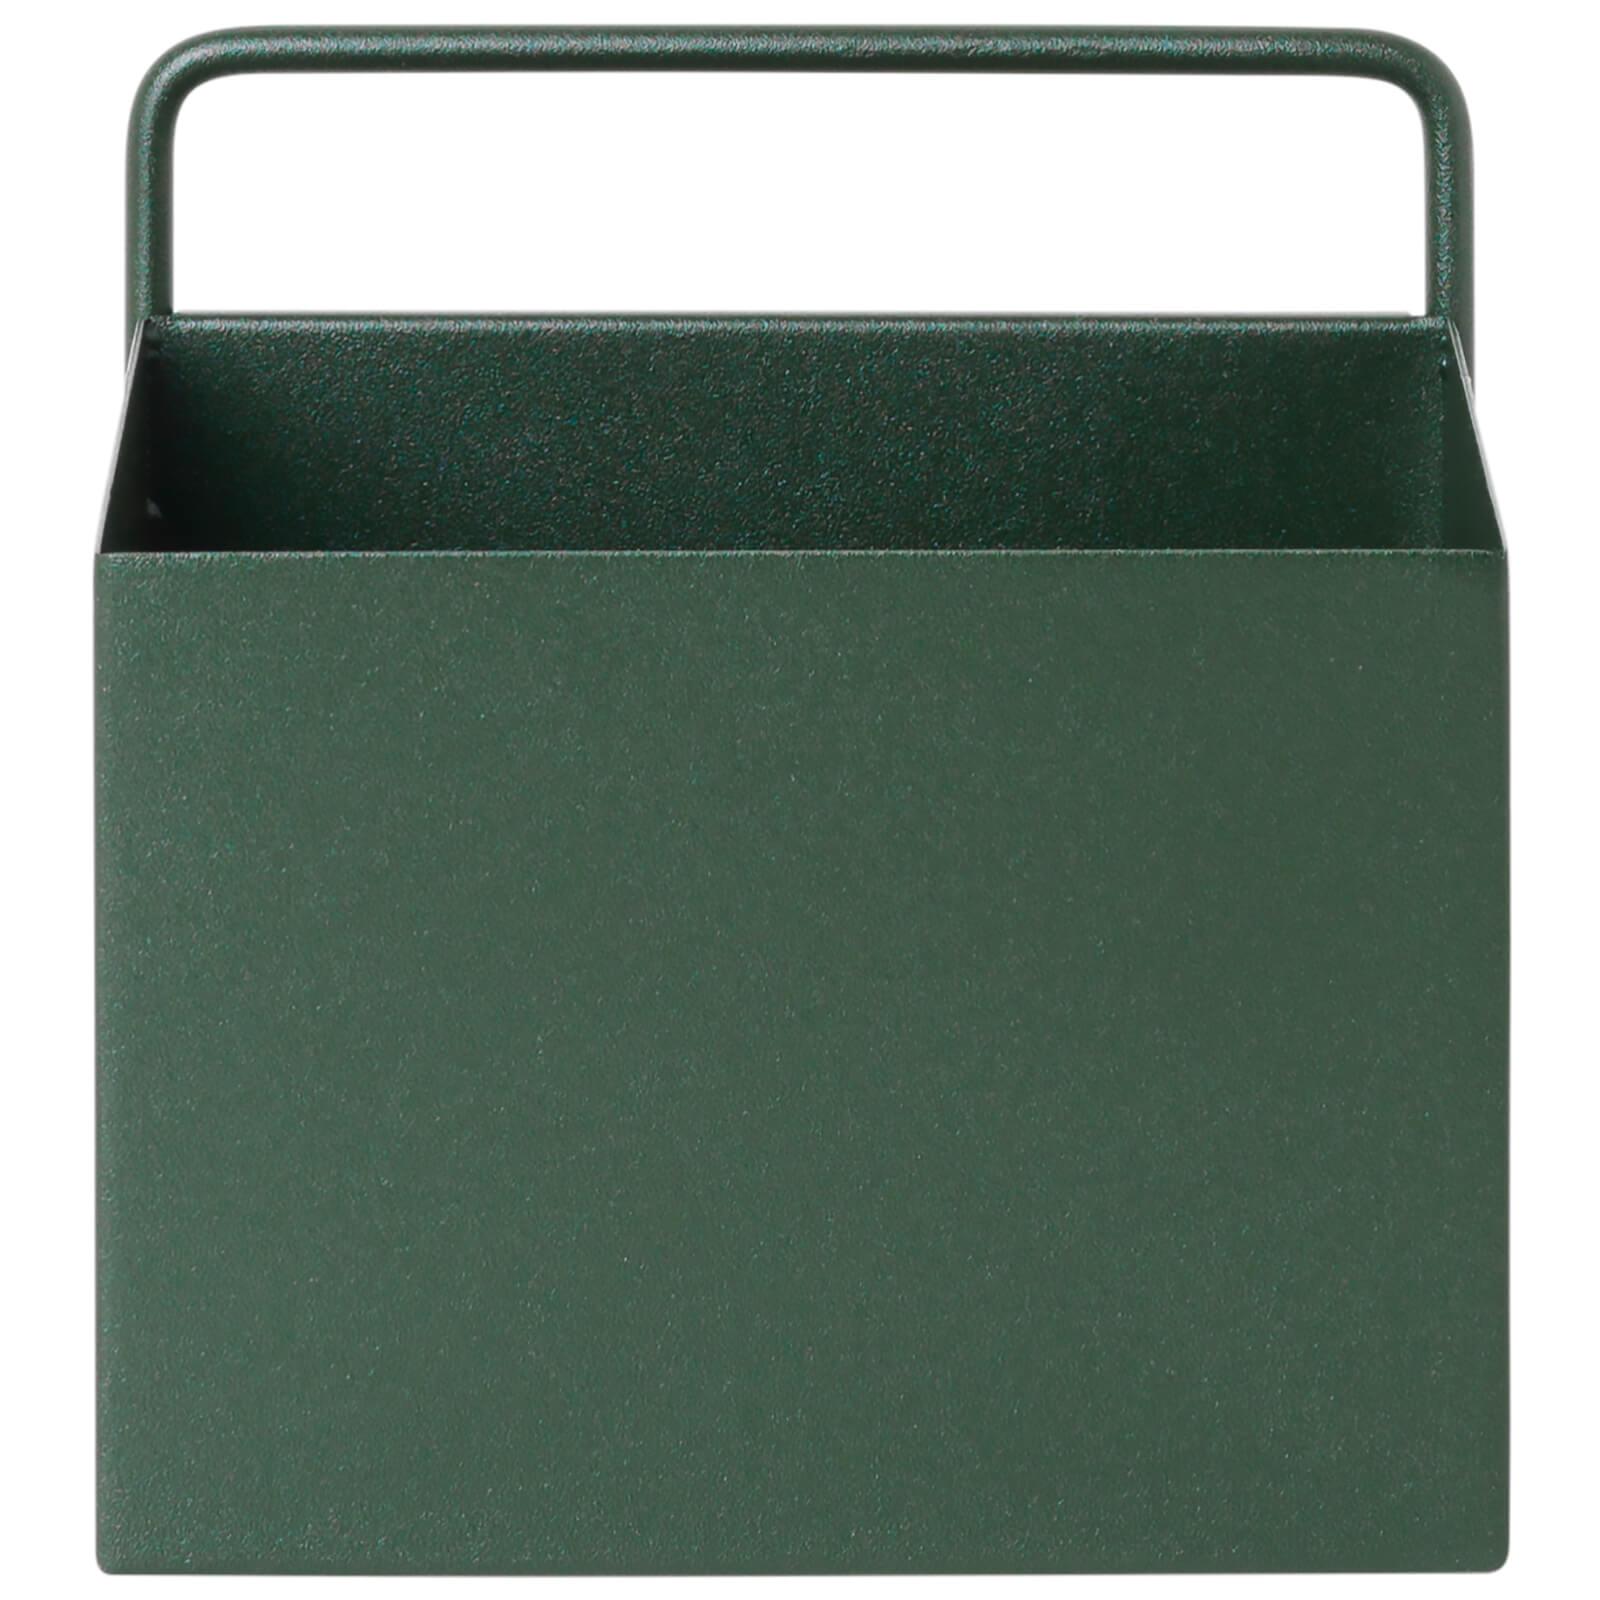 Ferm Living Wall Box - Square - Dark Green